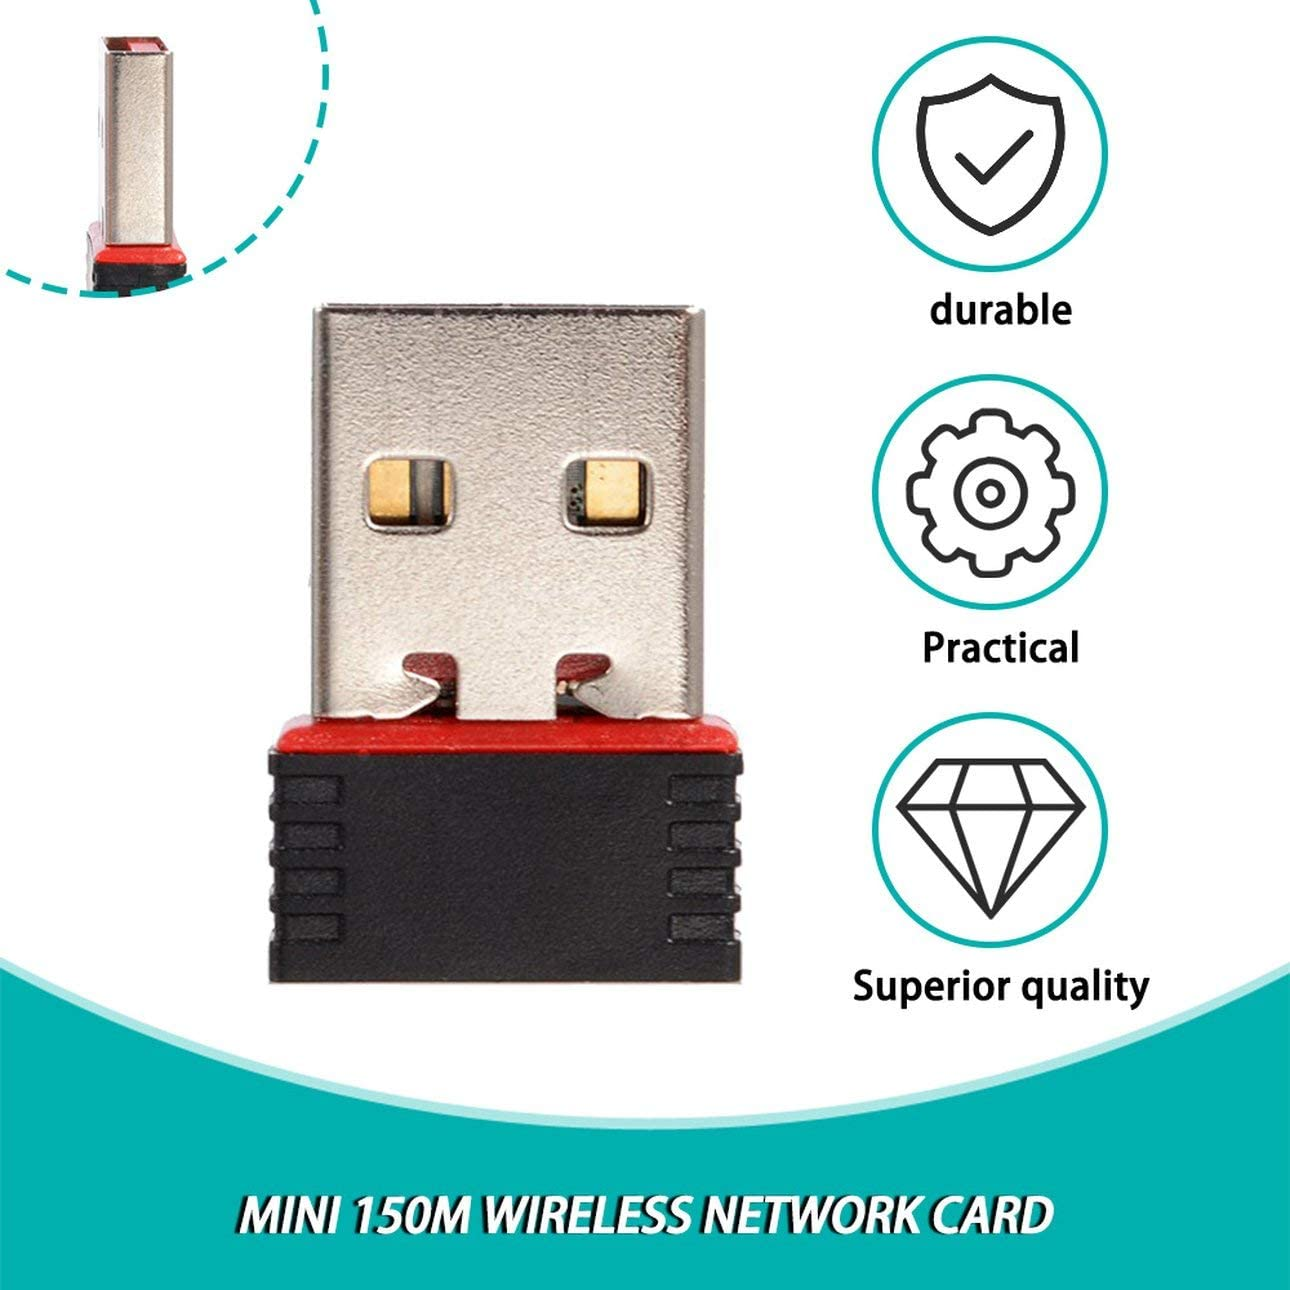 Liobaba 150Mbps 150M Mini USB WiFi Wireless Adapter Network LAN Card 802.11n//g//b Portable Mini Pockets USB WiFi Receivers Adapter